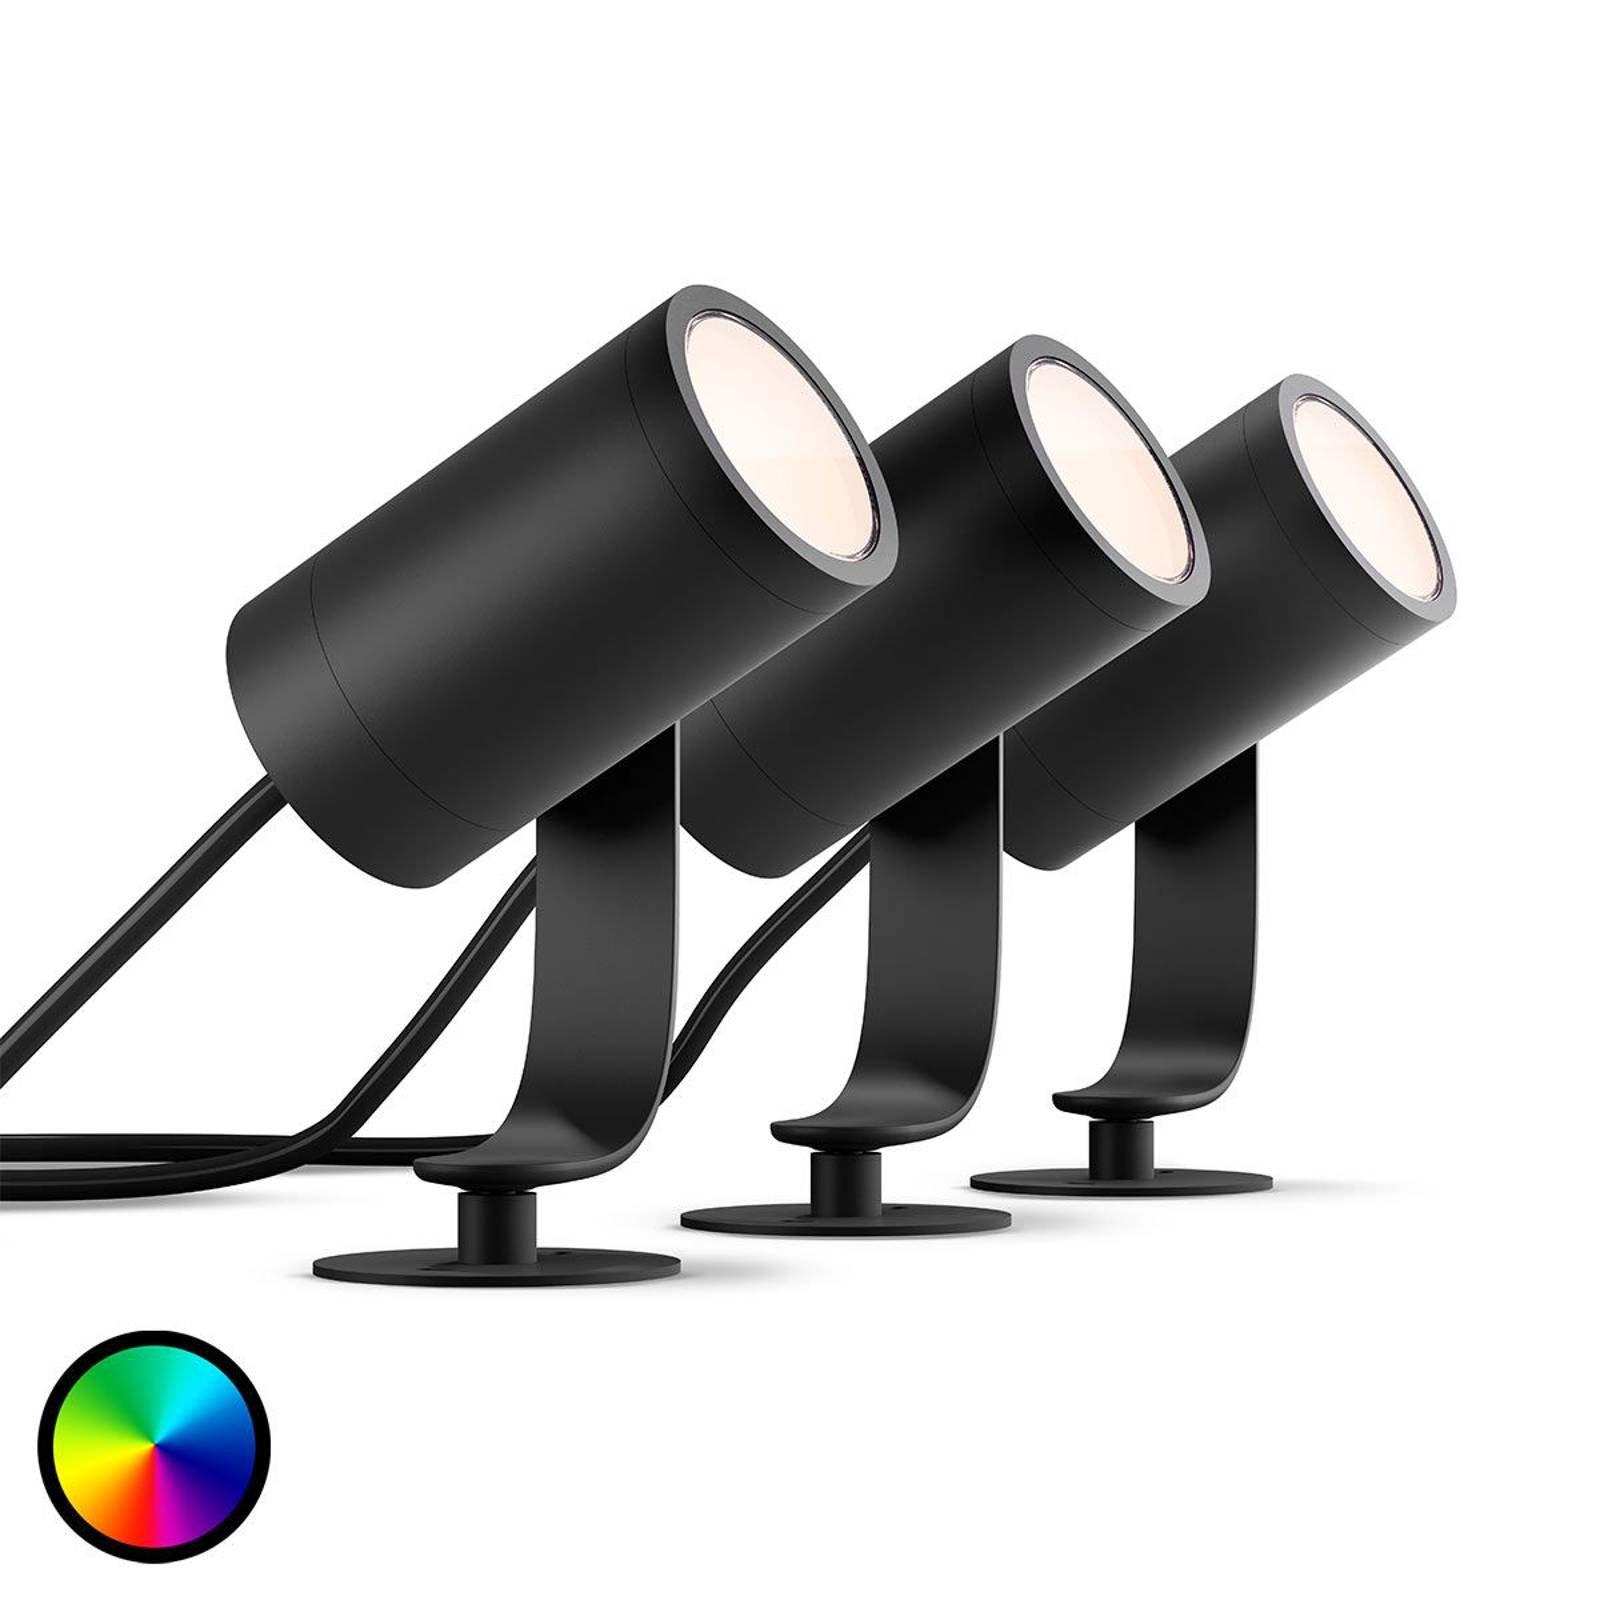 Philips Hue LED-spot Lily i grunnpakke med 3